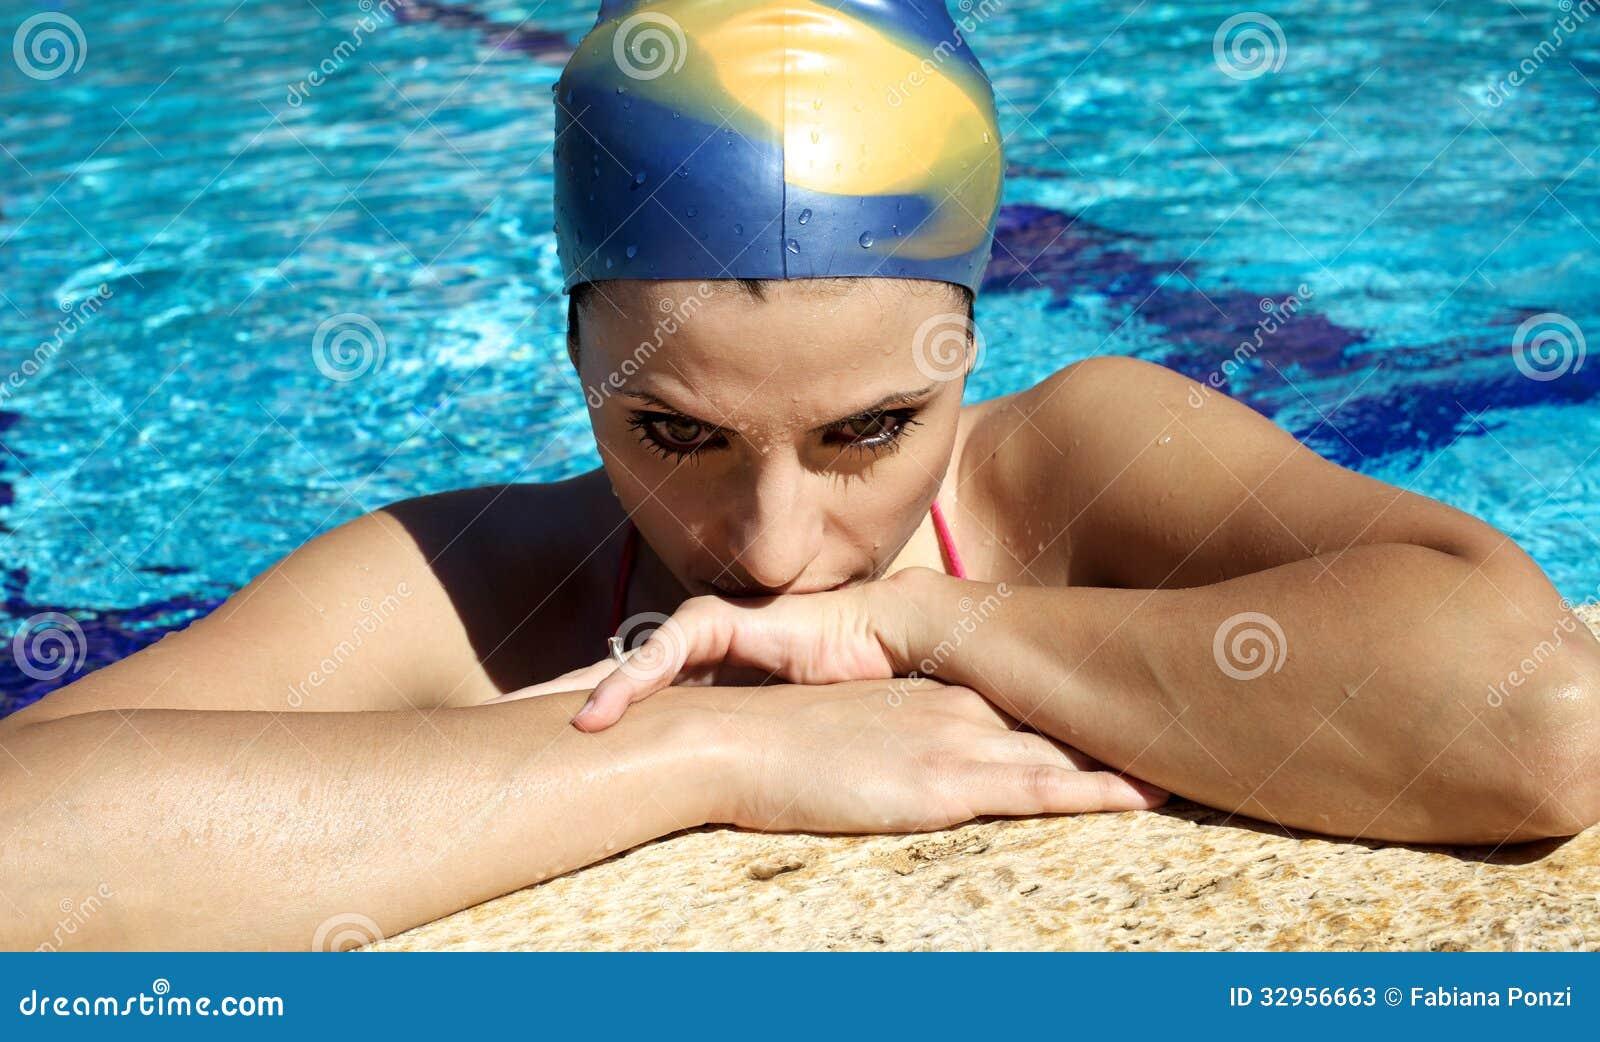 Фото девушек плавчих